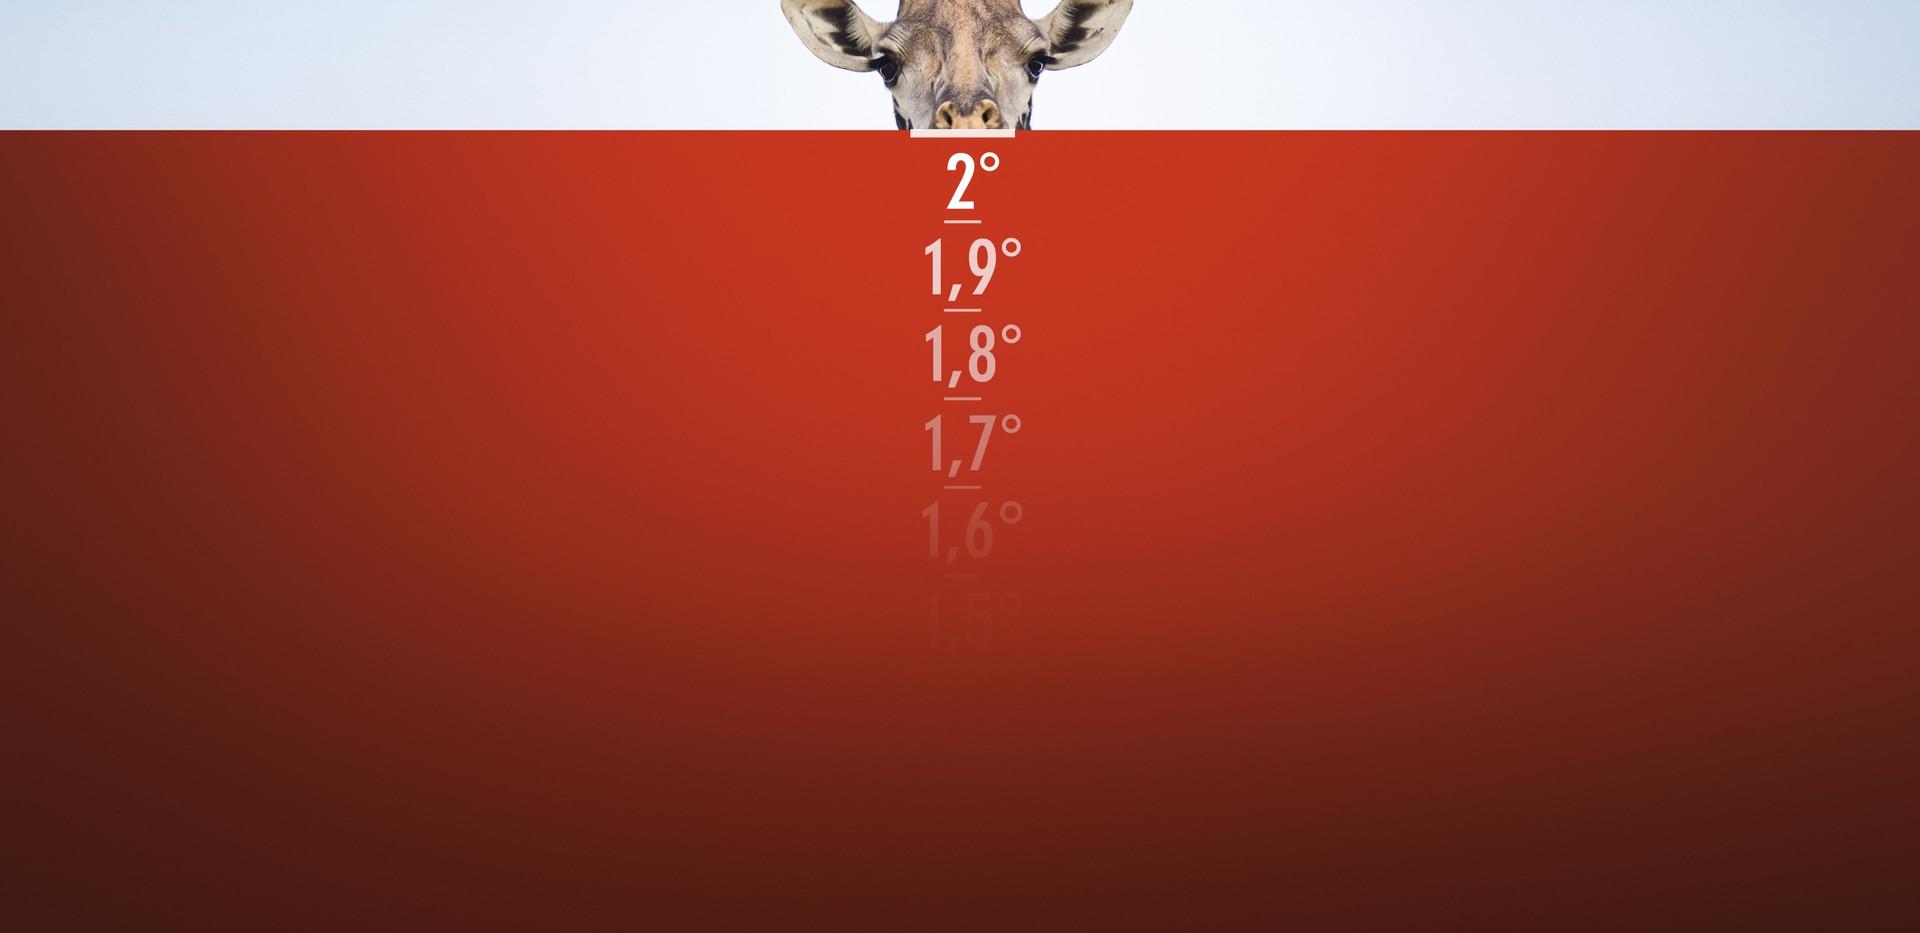 wwf-giraffe-elephant-polar-bear-print-37